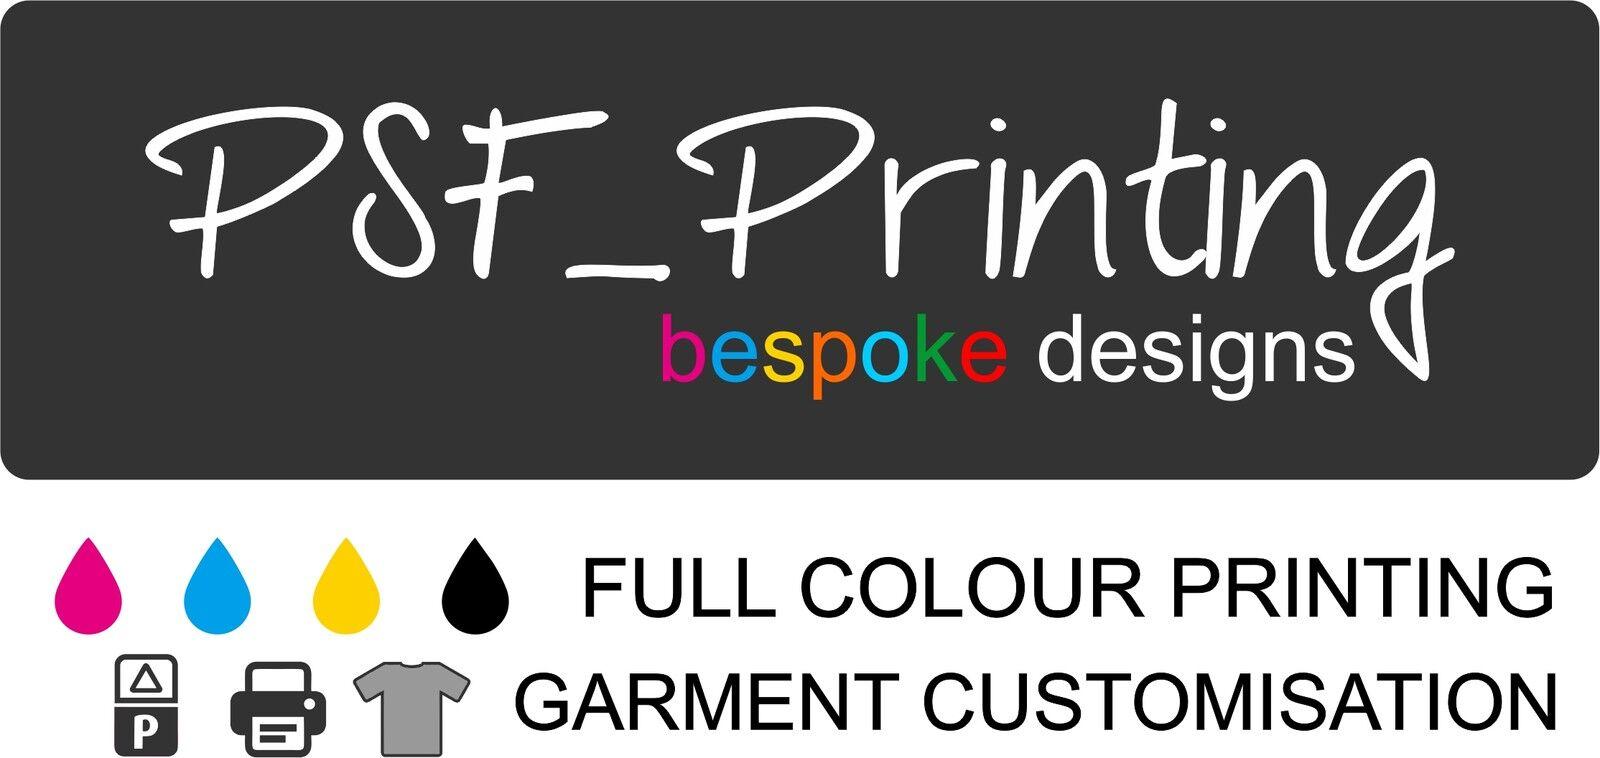 PSF_Printing